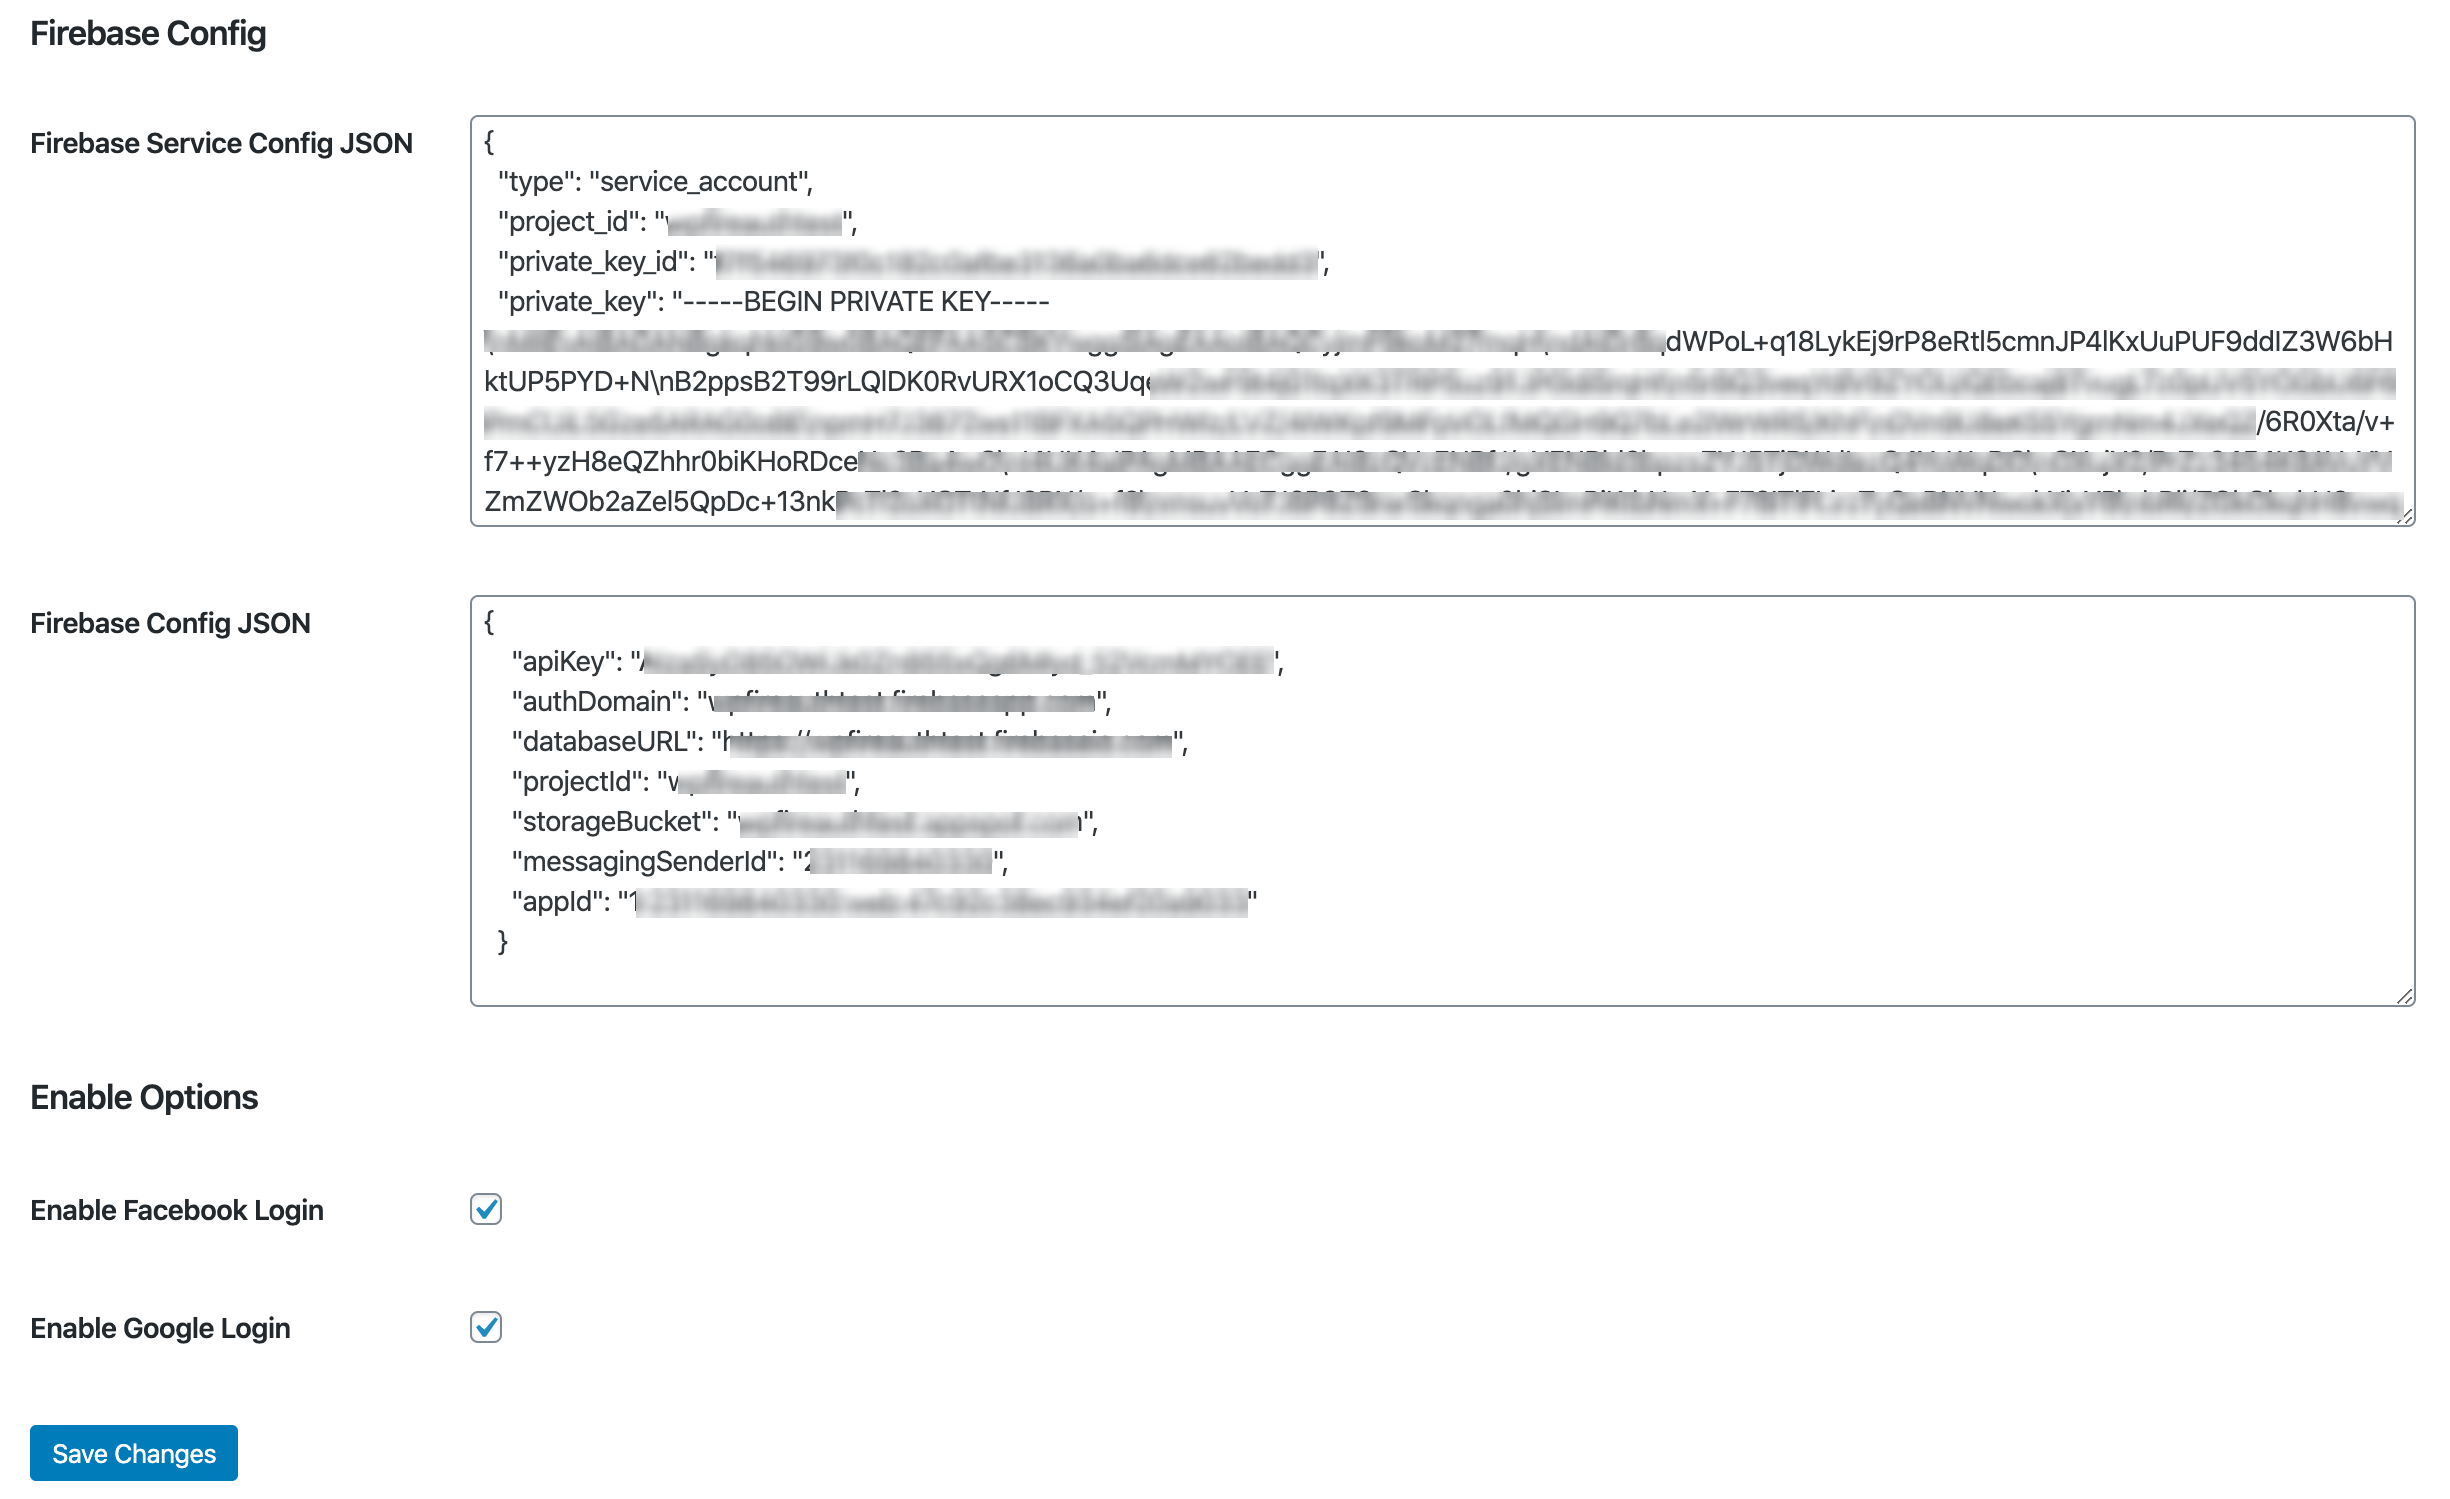 Fireauth Wordpress Plugin Configurations